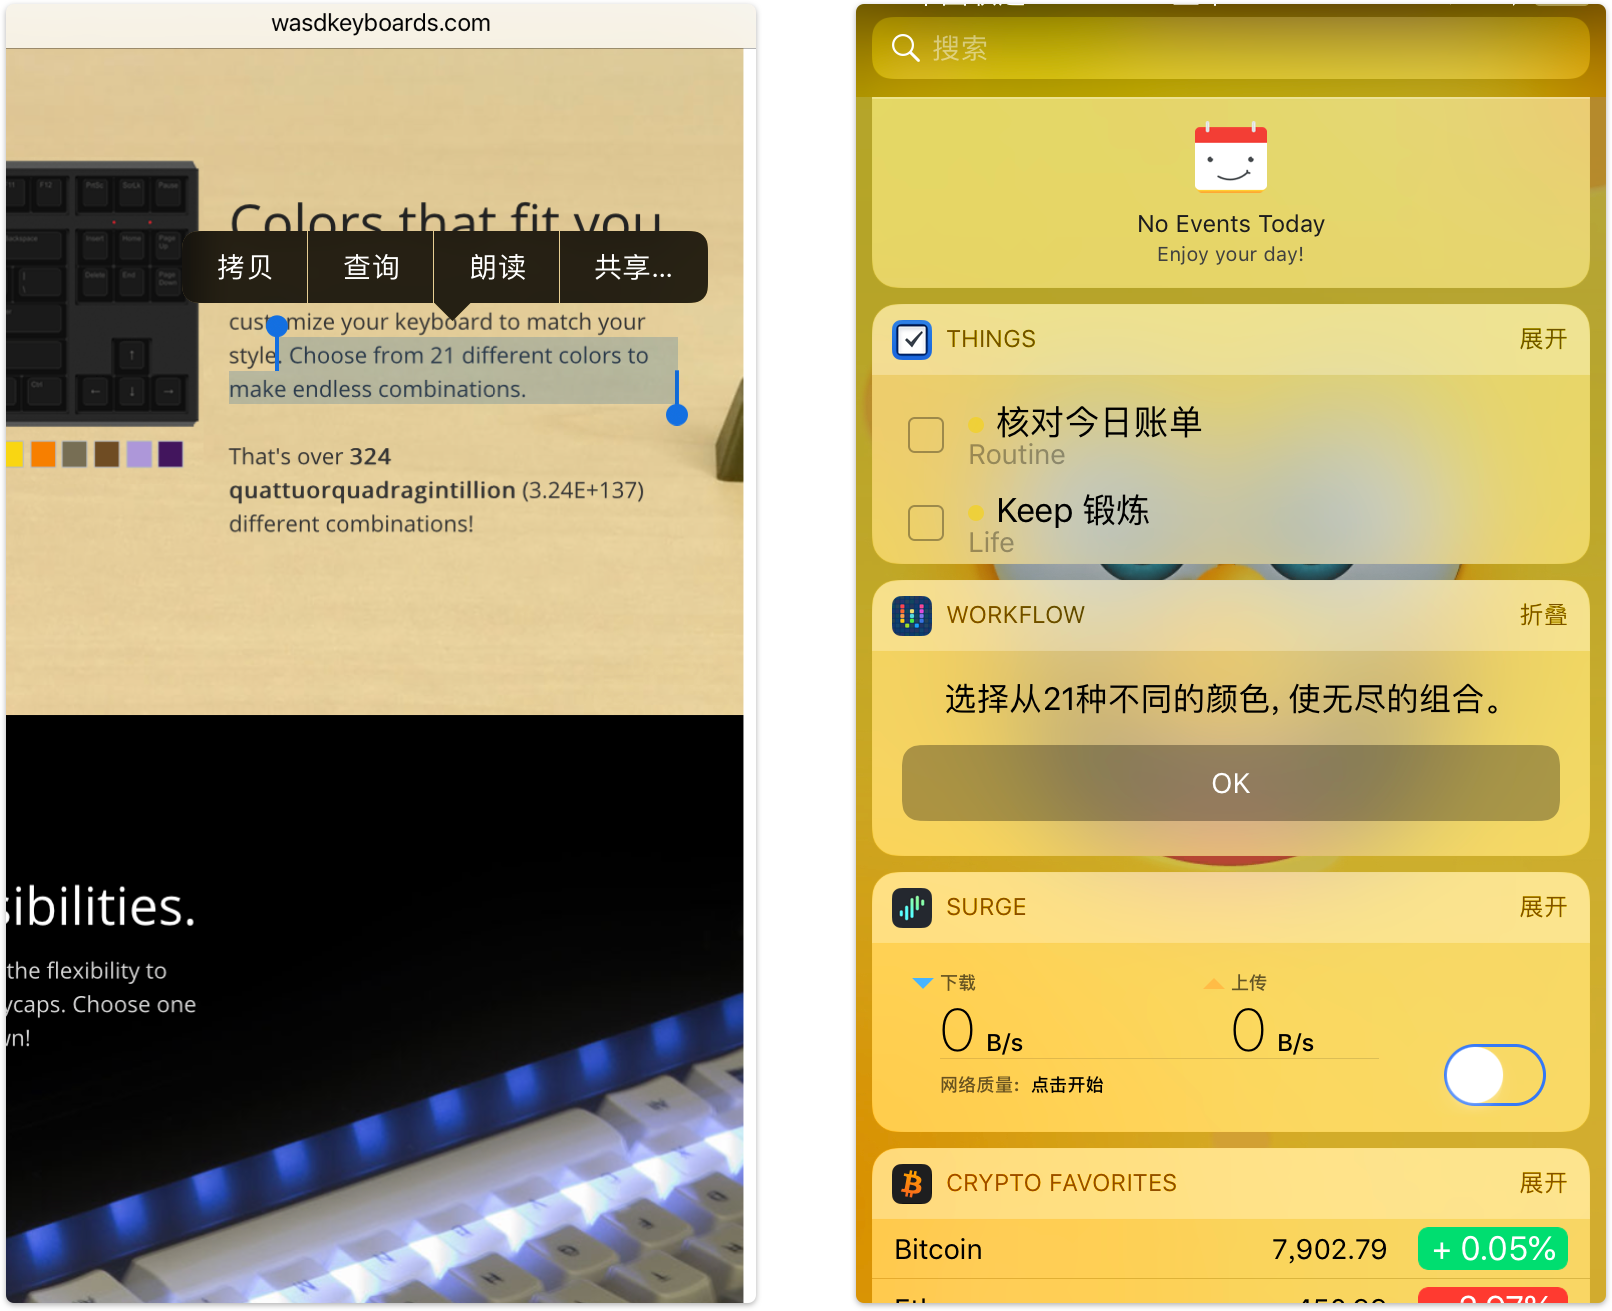 iOS 效率神器 Workflow 怎么用?跟着这篇入门指南从零开始